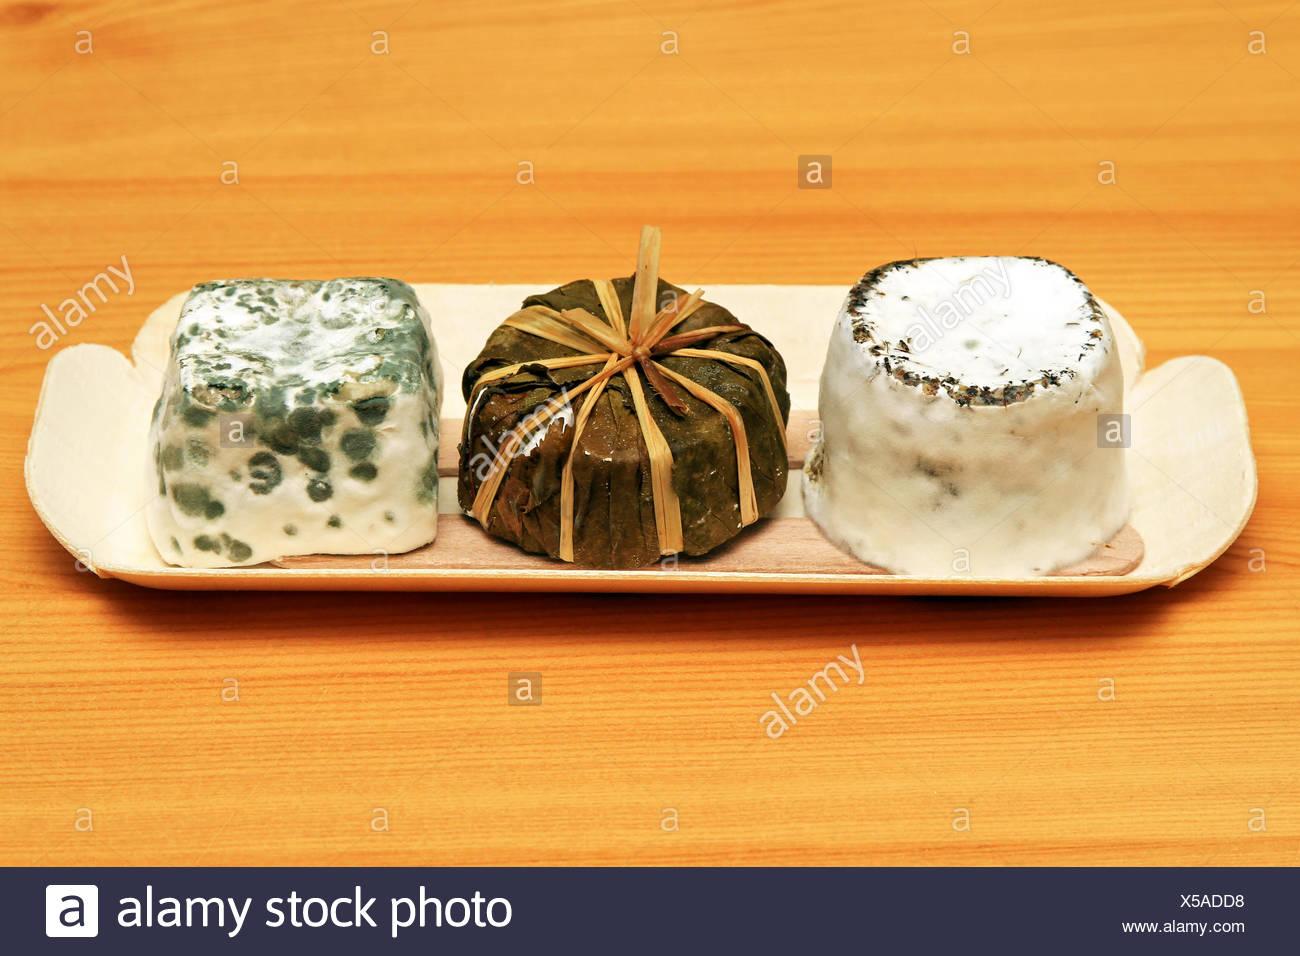 Chevre cheese - Stock Image